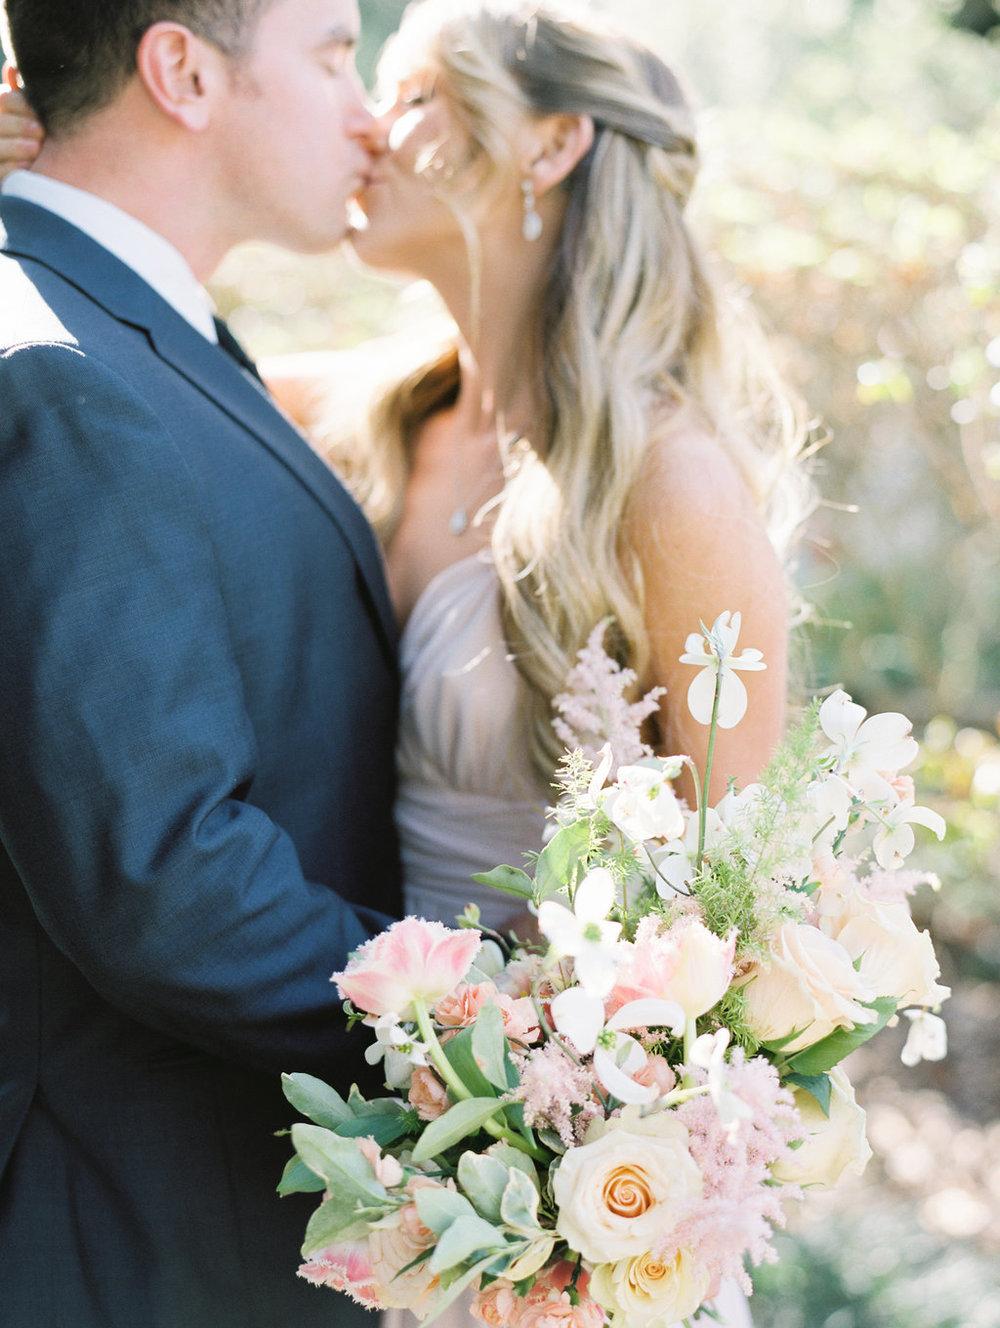 Cator-Woolford-Gardens-Engagement-atlanta-wedding-photographer-hannah-forsberg-23.jpg